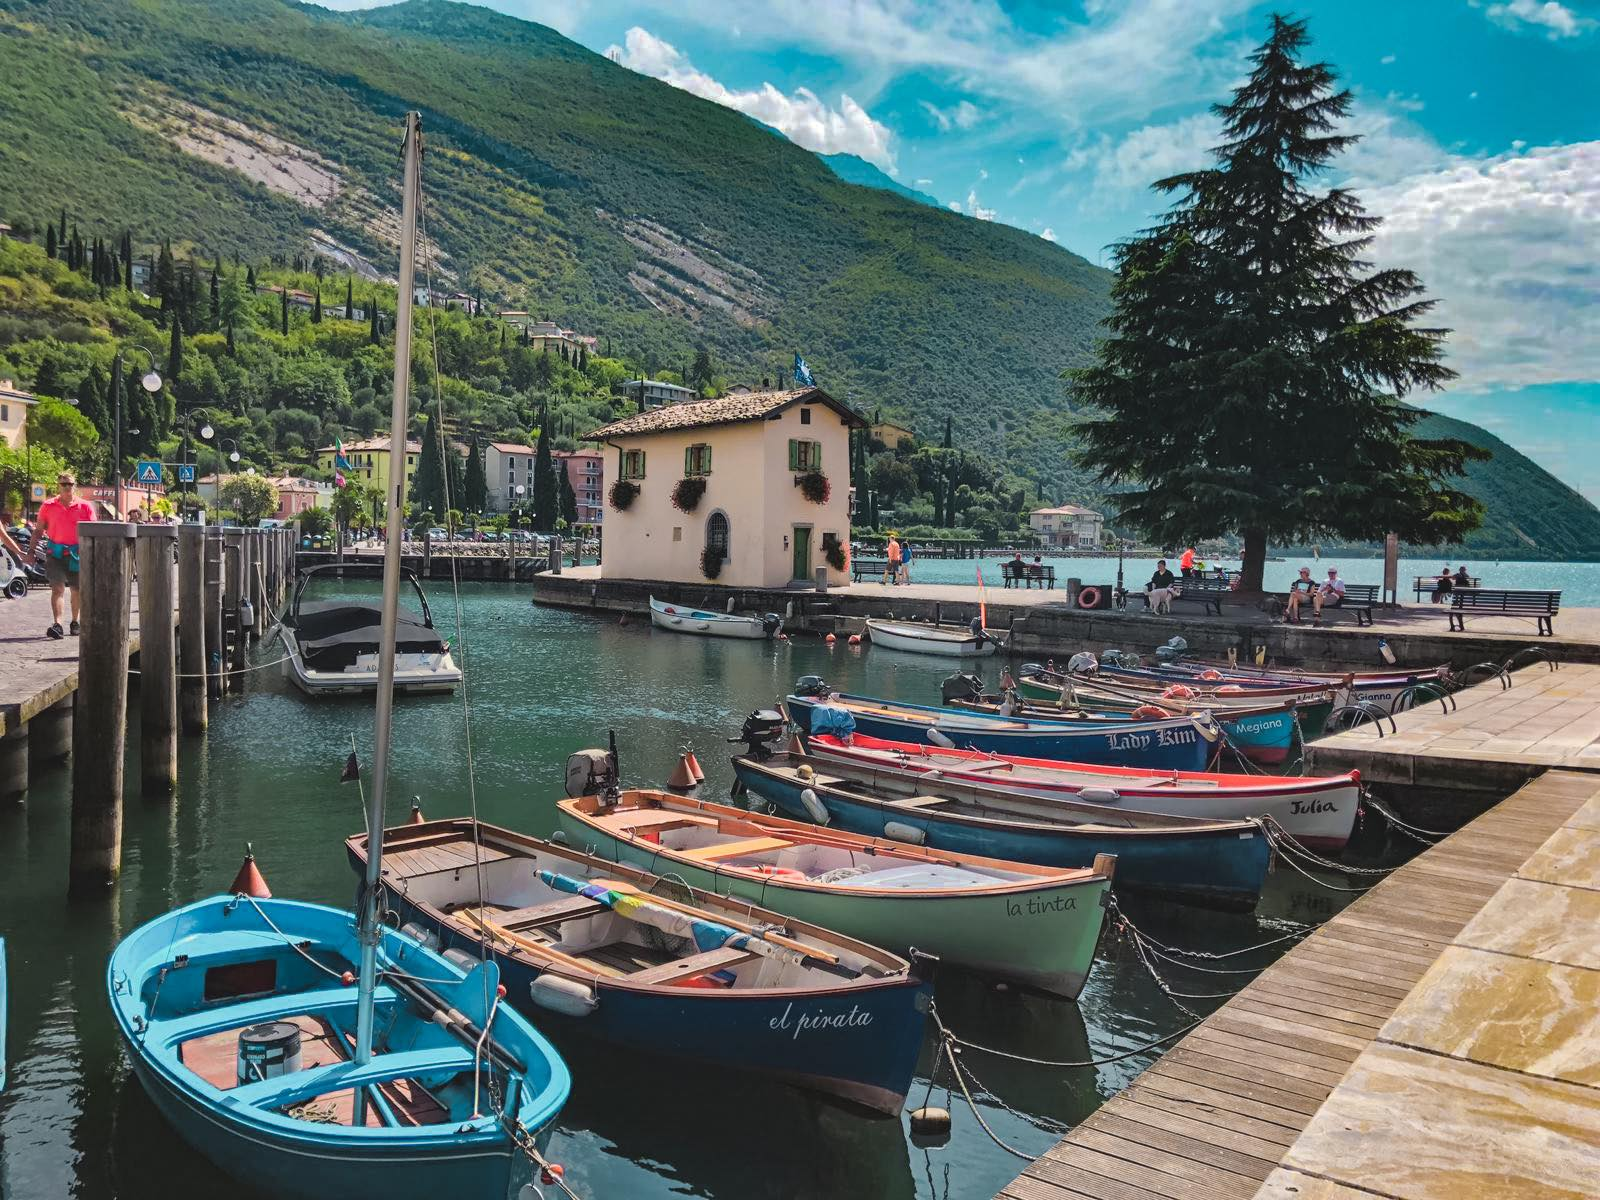 Life On The Road Day 131 Hello from Lago di Garda, ITALY25.jpg